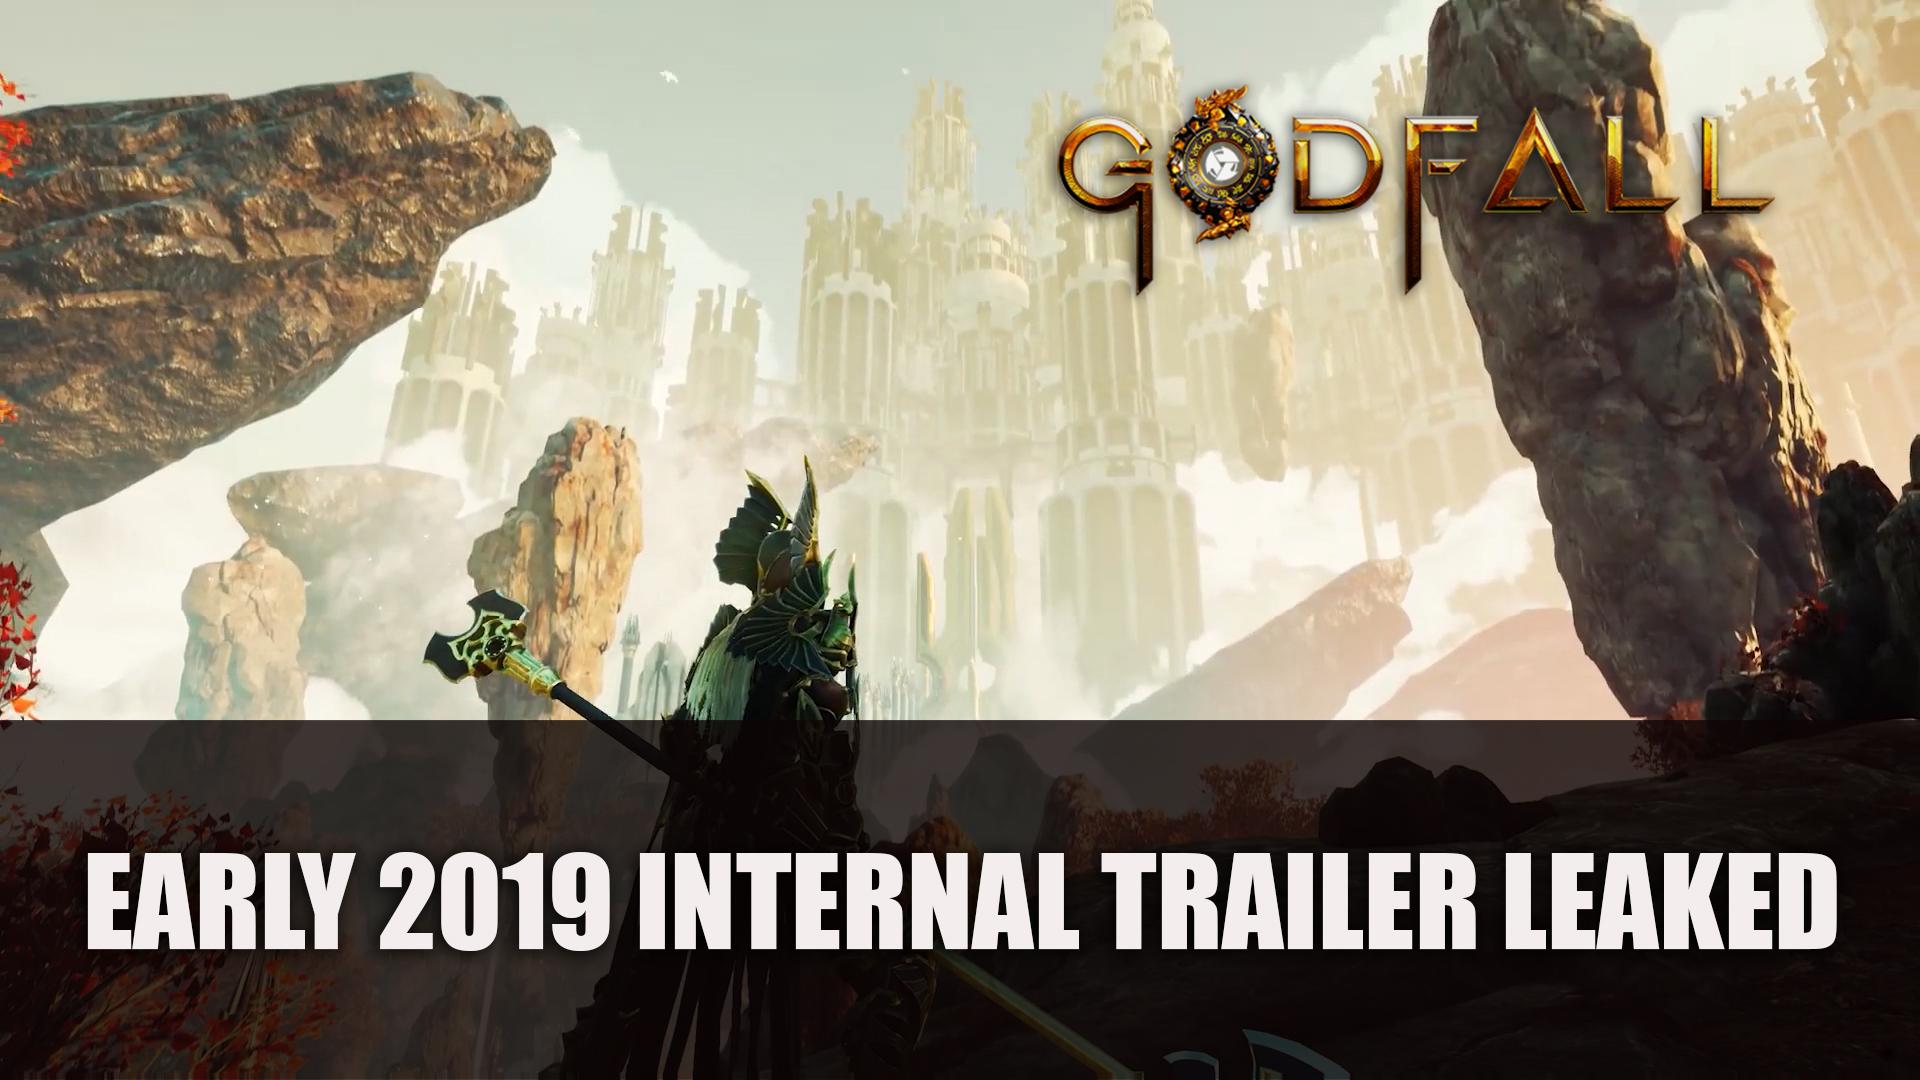 Godfall Early 2019 Internal Trailer Leaked Fextralife